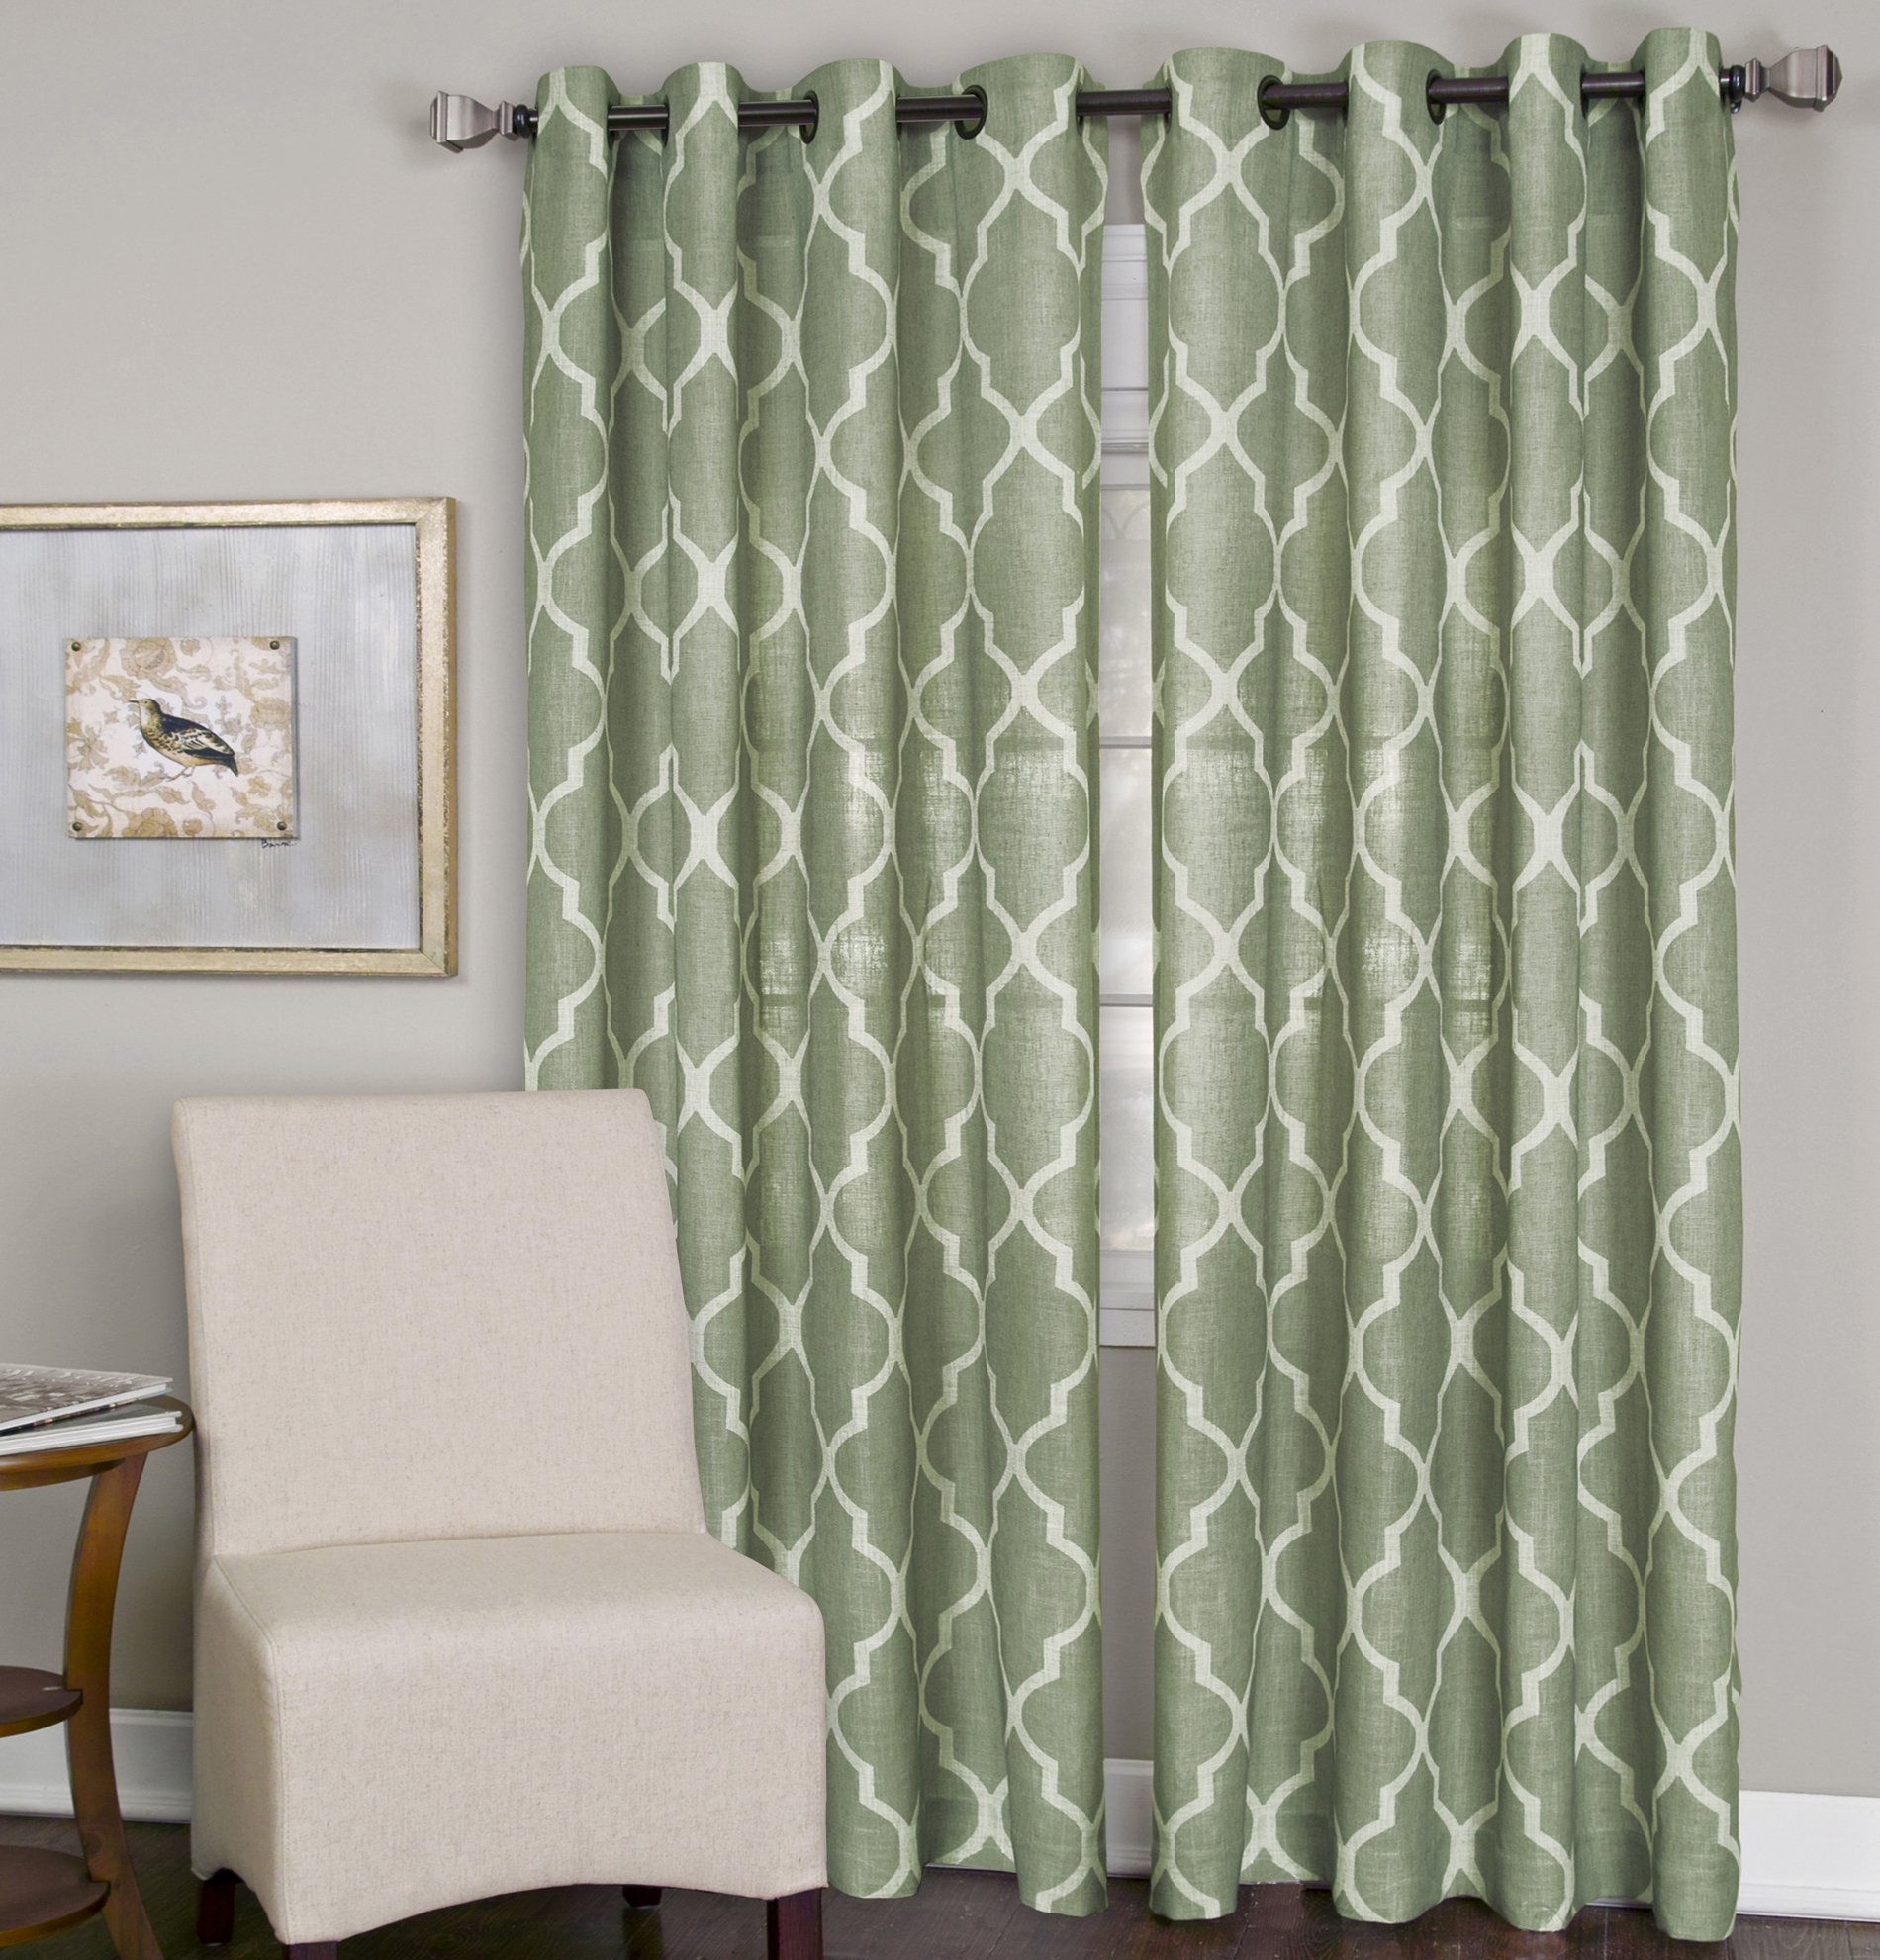 Elrene Home Fashions 026865775846 Grommet Top Linen Look Single Panel Window Curtain Drape, 52'' x 120'', Spa Green